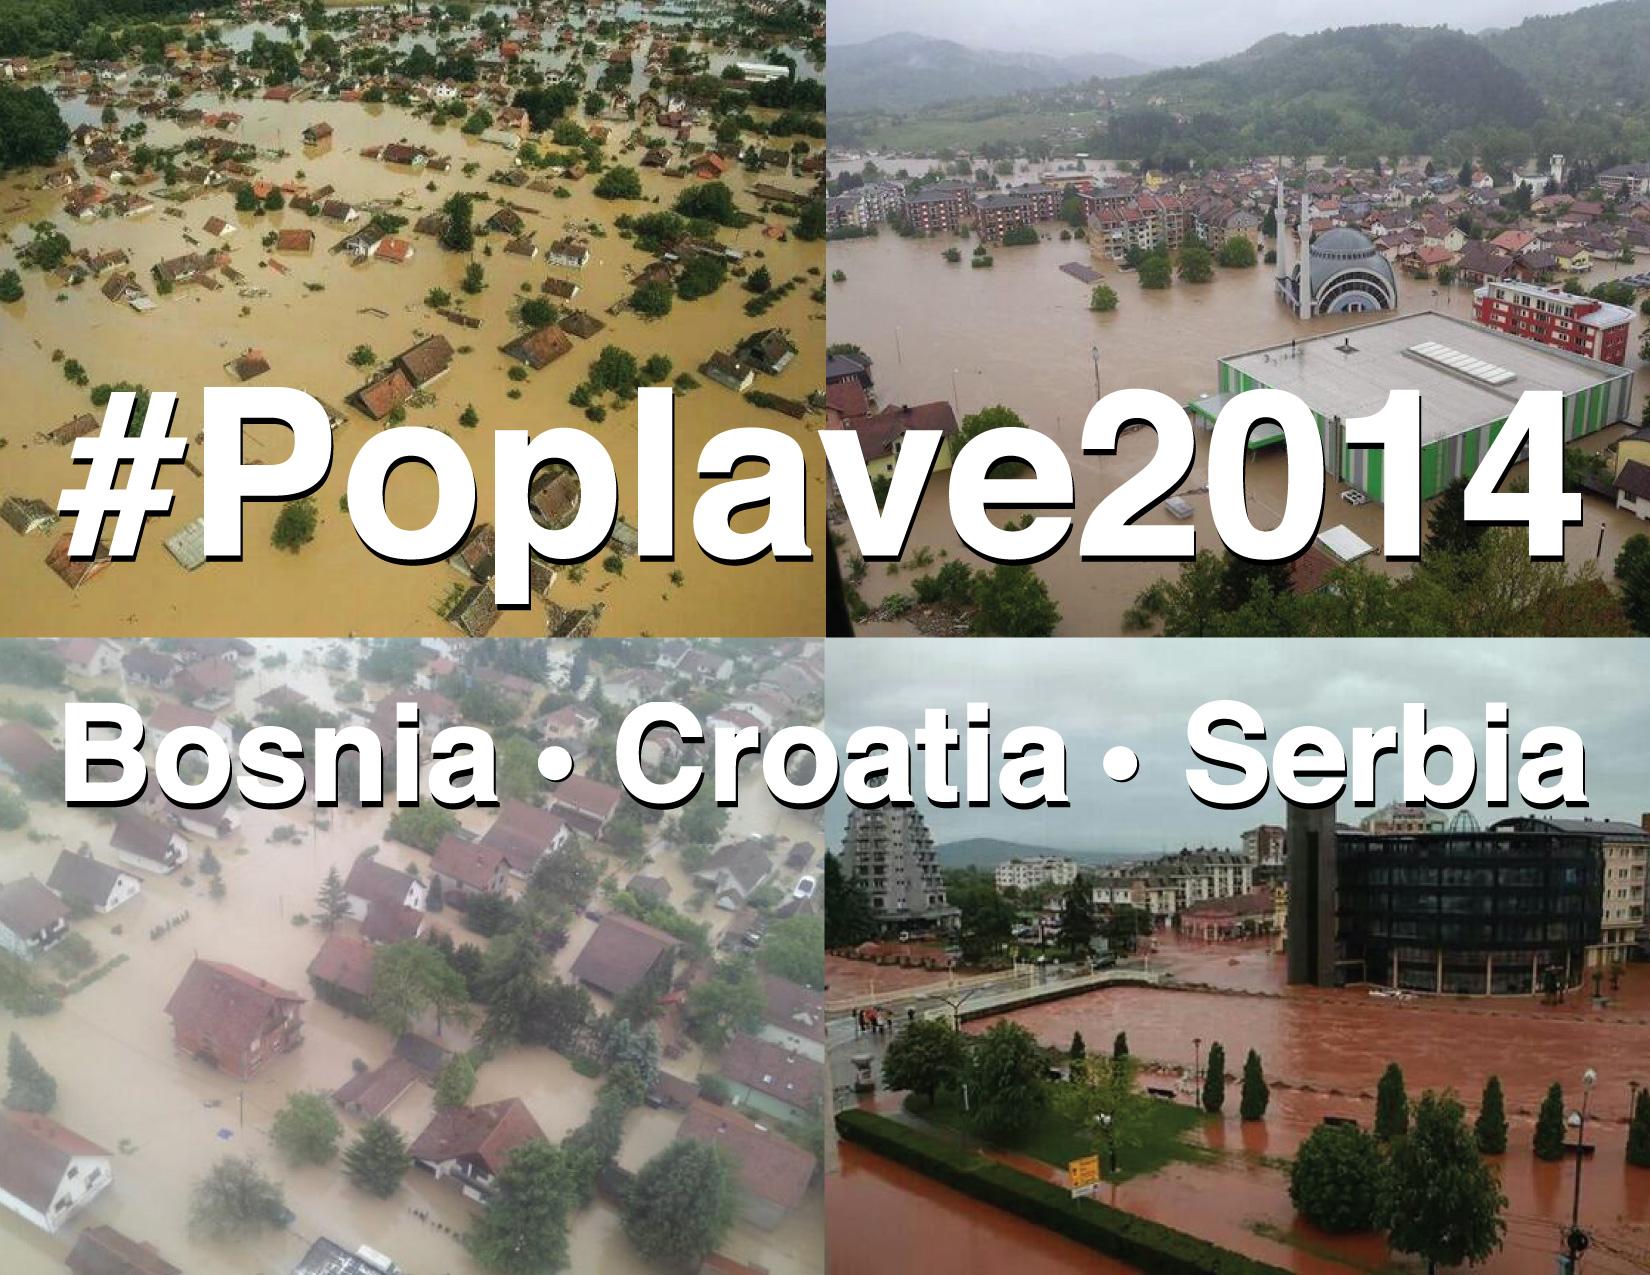 poplave-new-final-01.jpg